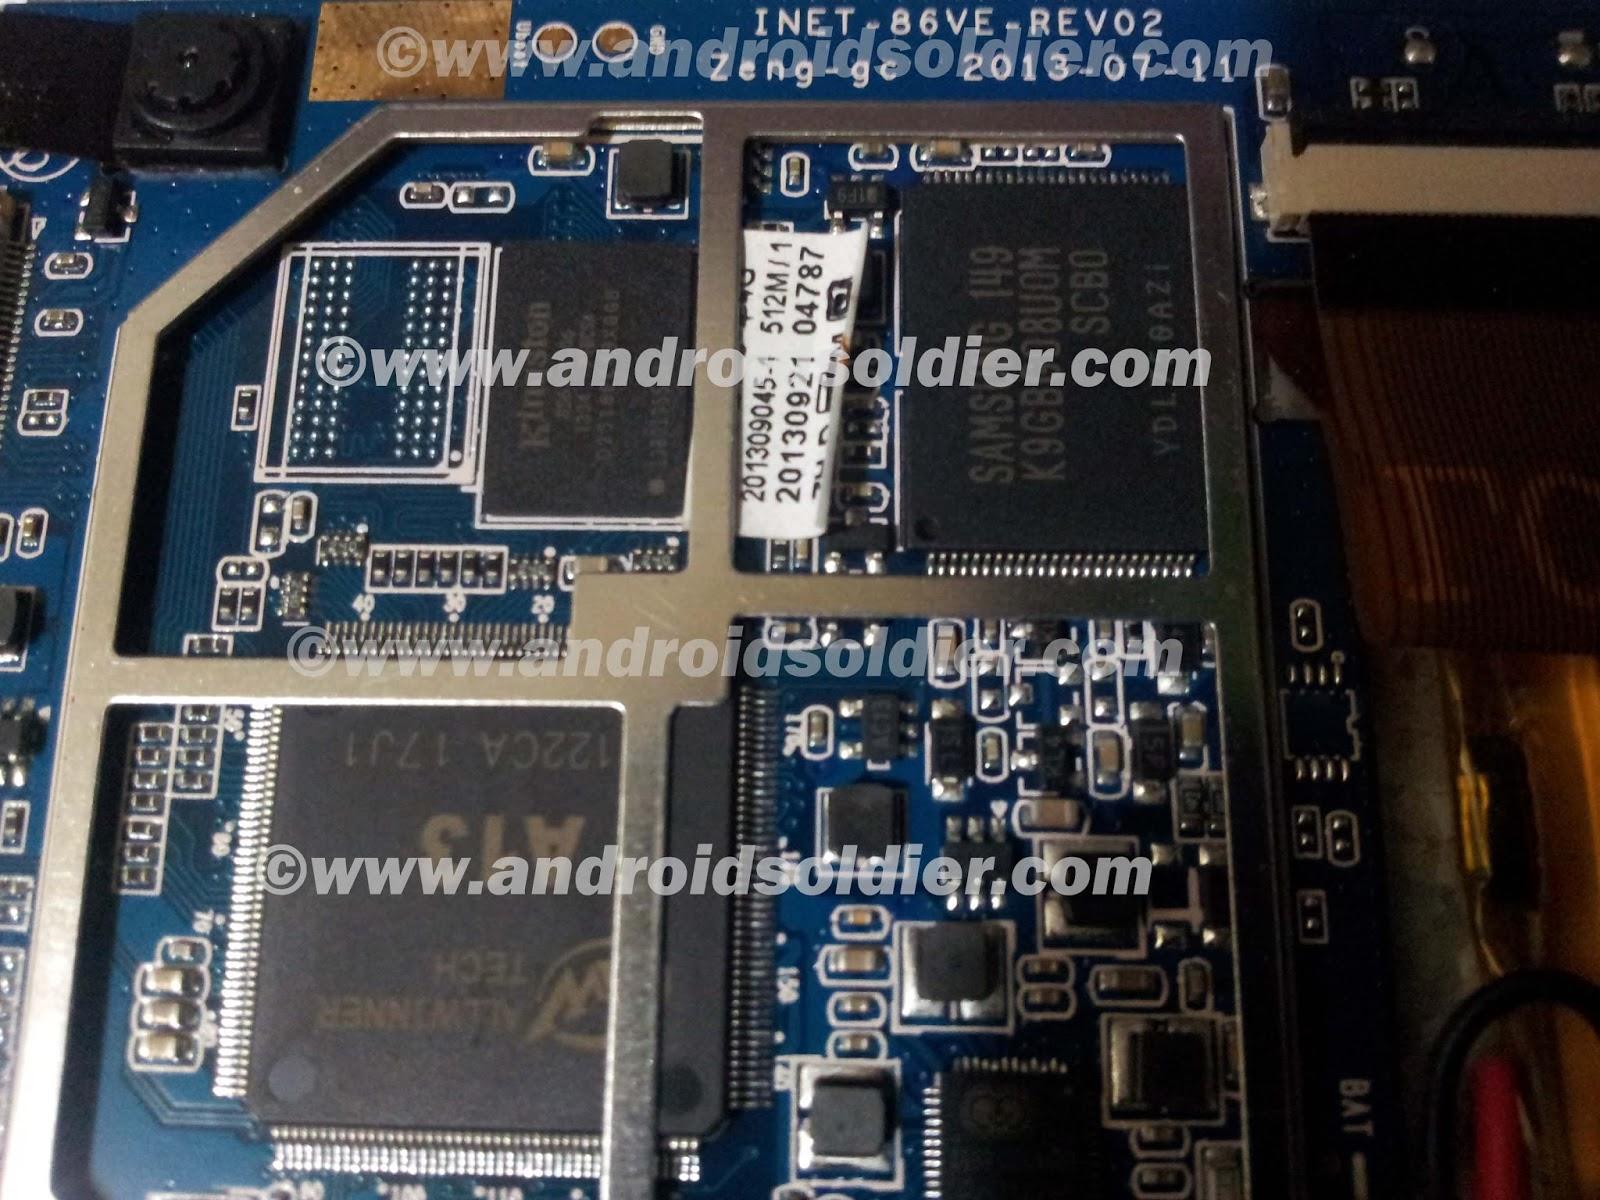 Epad a721j firmware download.